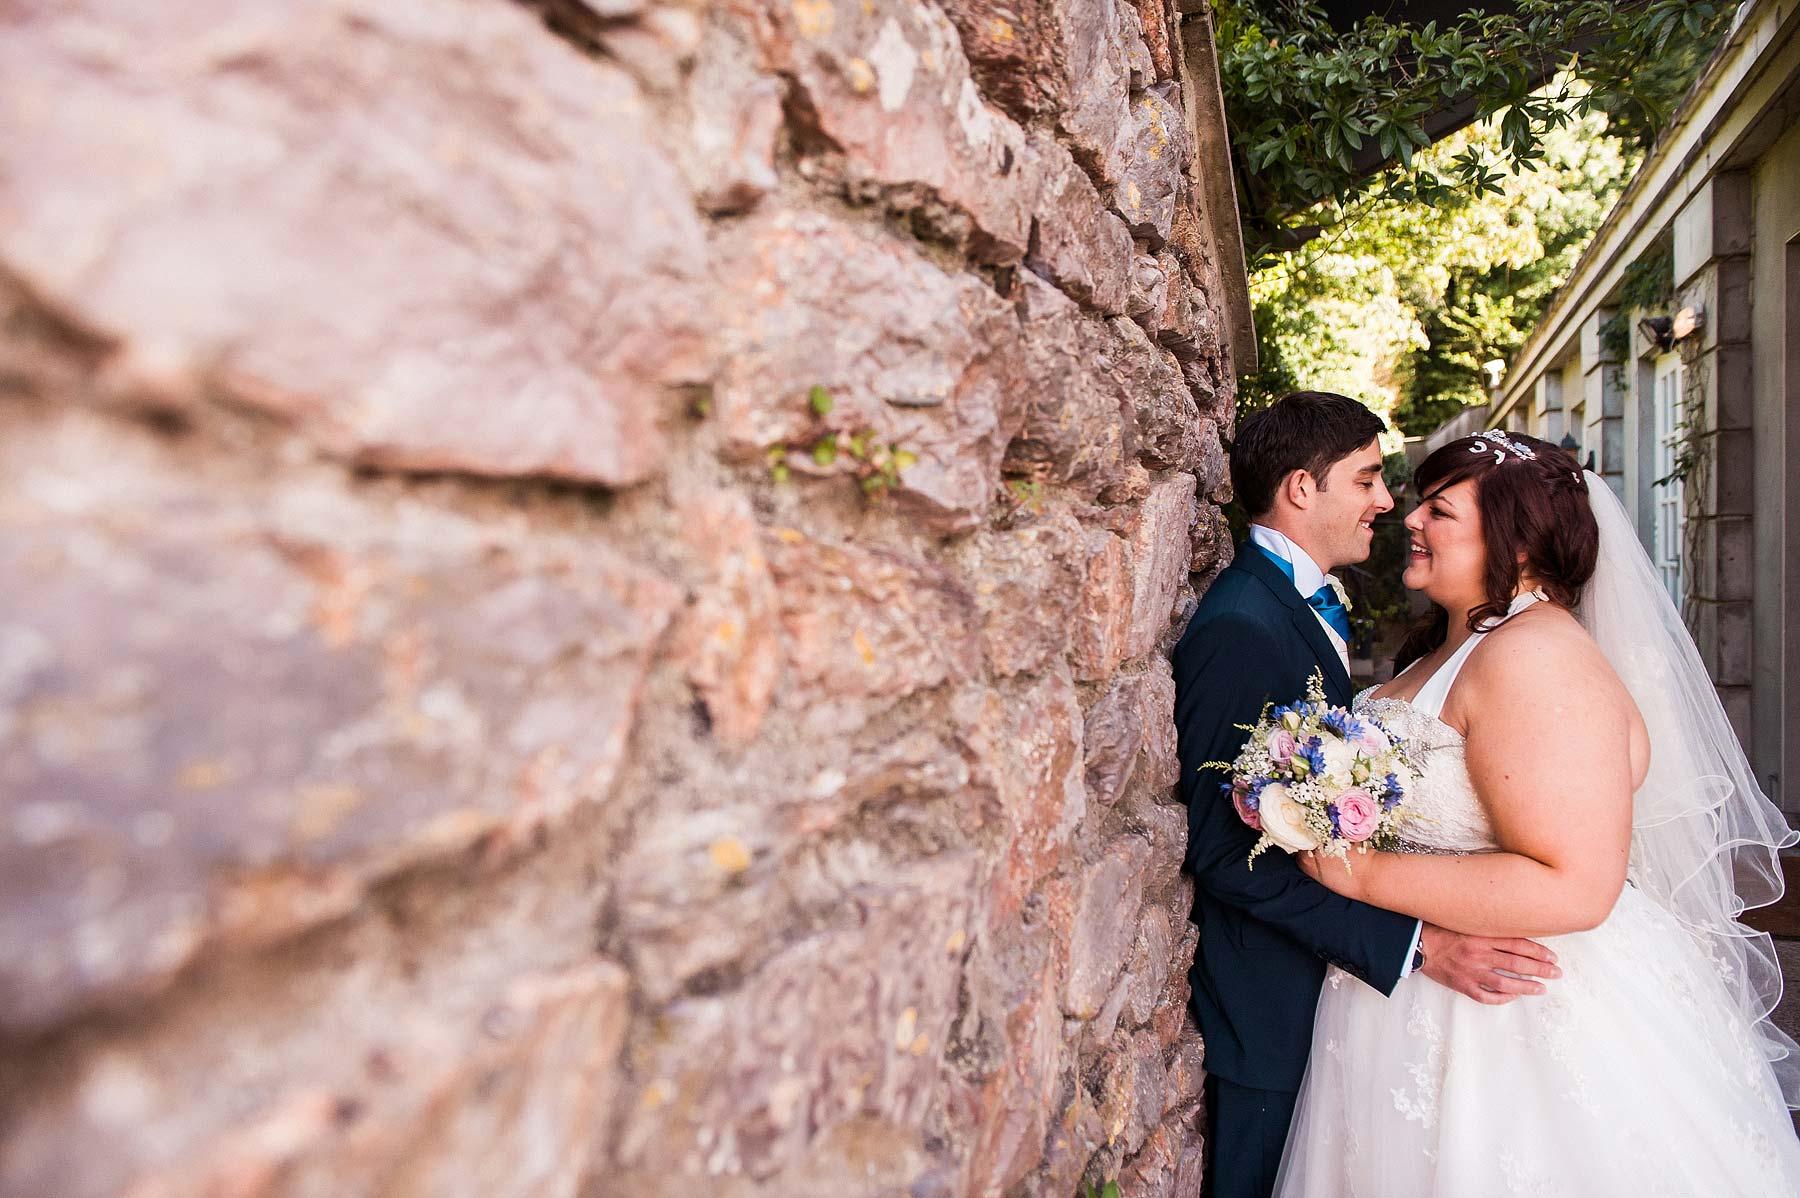 berry-head-hotel-brixham-wedding-photographer-073